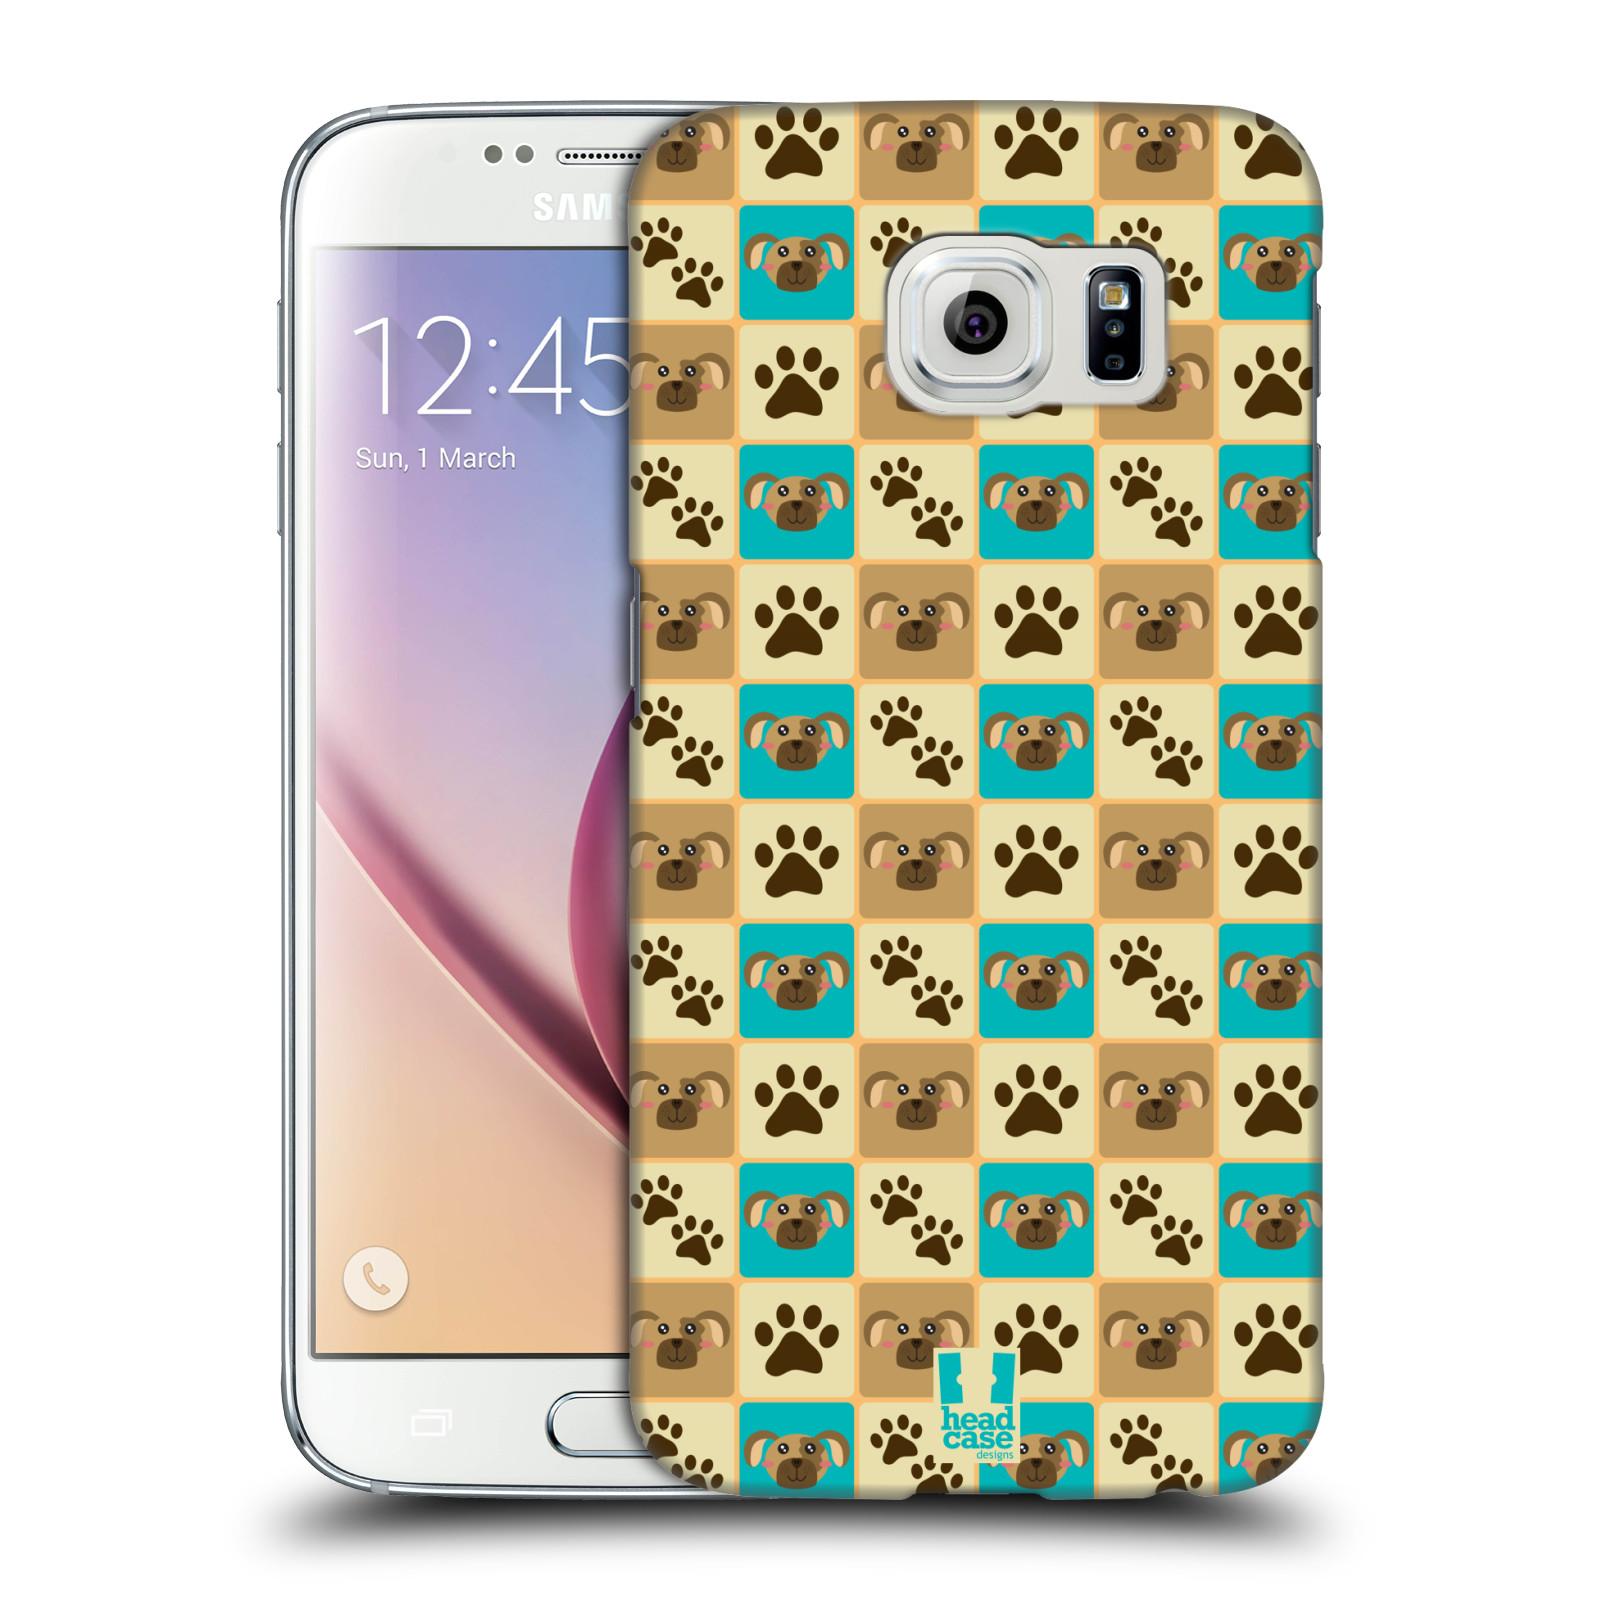 HEAD CASE plastový obal na mobil SAMSUNG Galaxy S6 (G9200, G920F) vzor Zvířecí razítka PSÍ TLAPKA